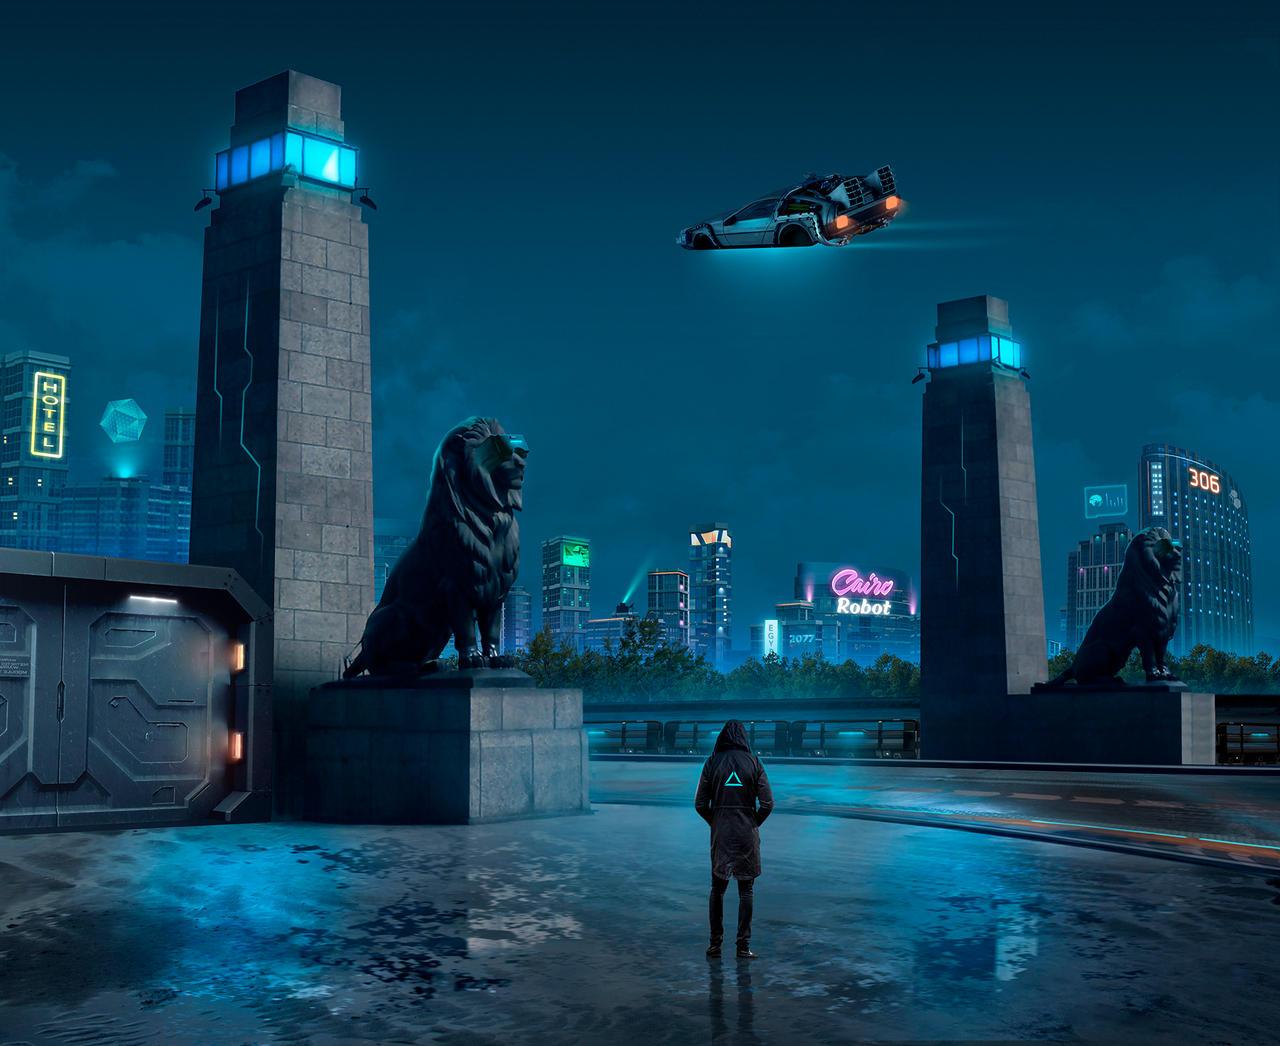 Egypt 2077 on Qasr El-Nil Bridge